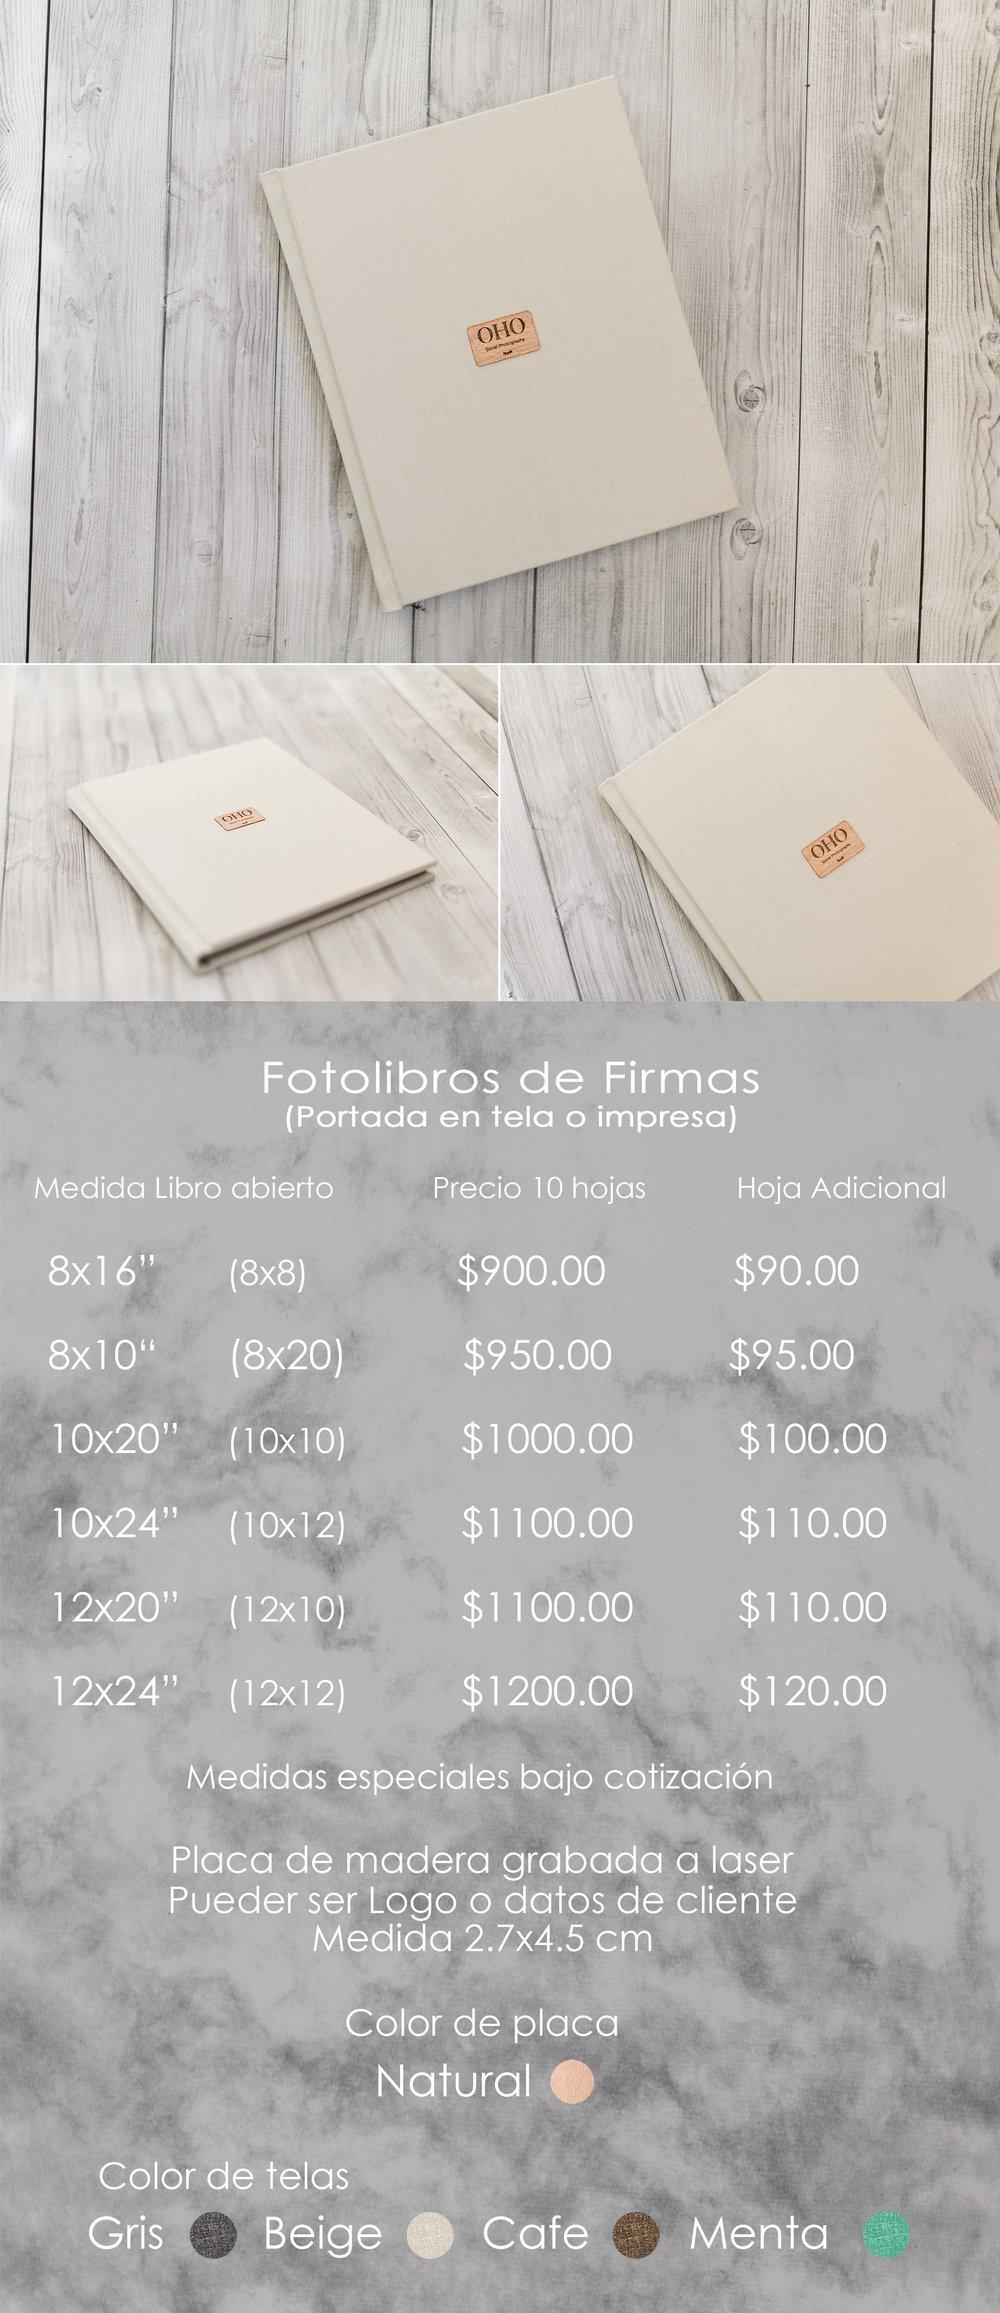 Fotolibro de firmas